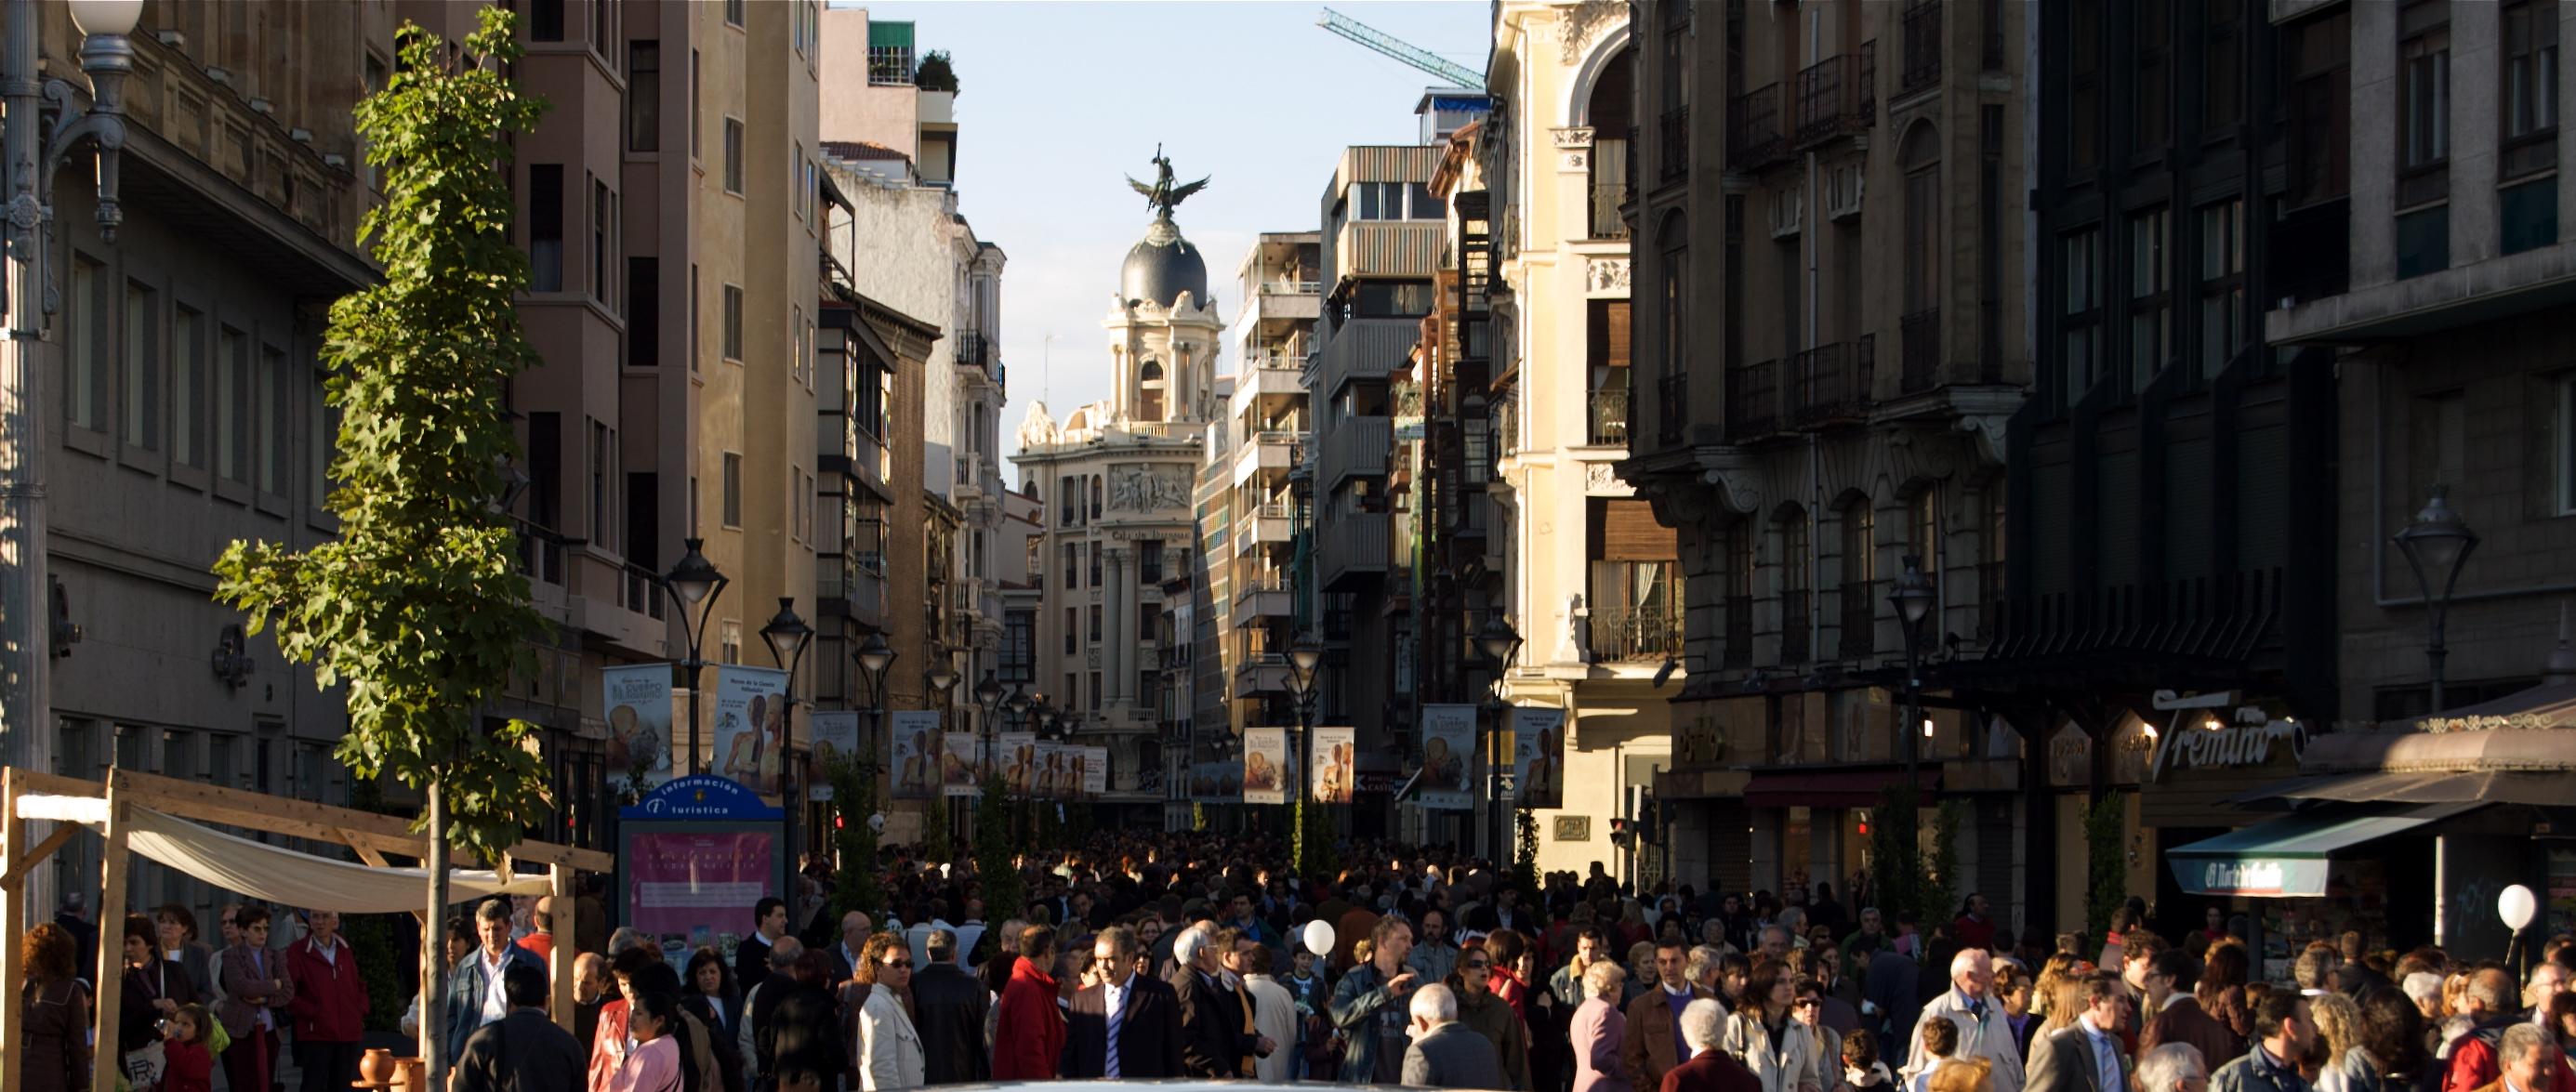 File calle santiago wikimedia commons - Calle santiago madrid ...